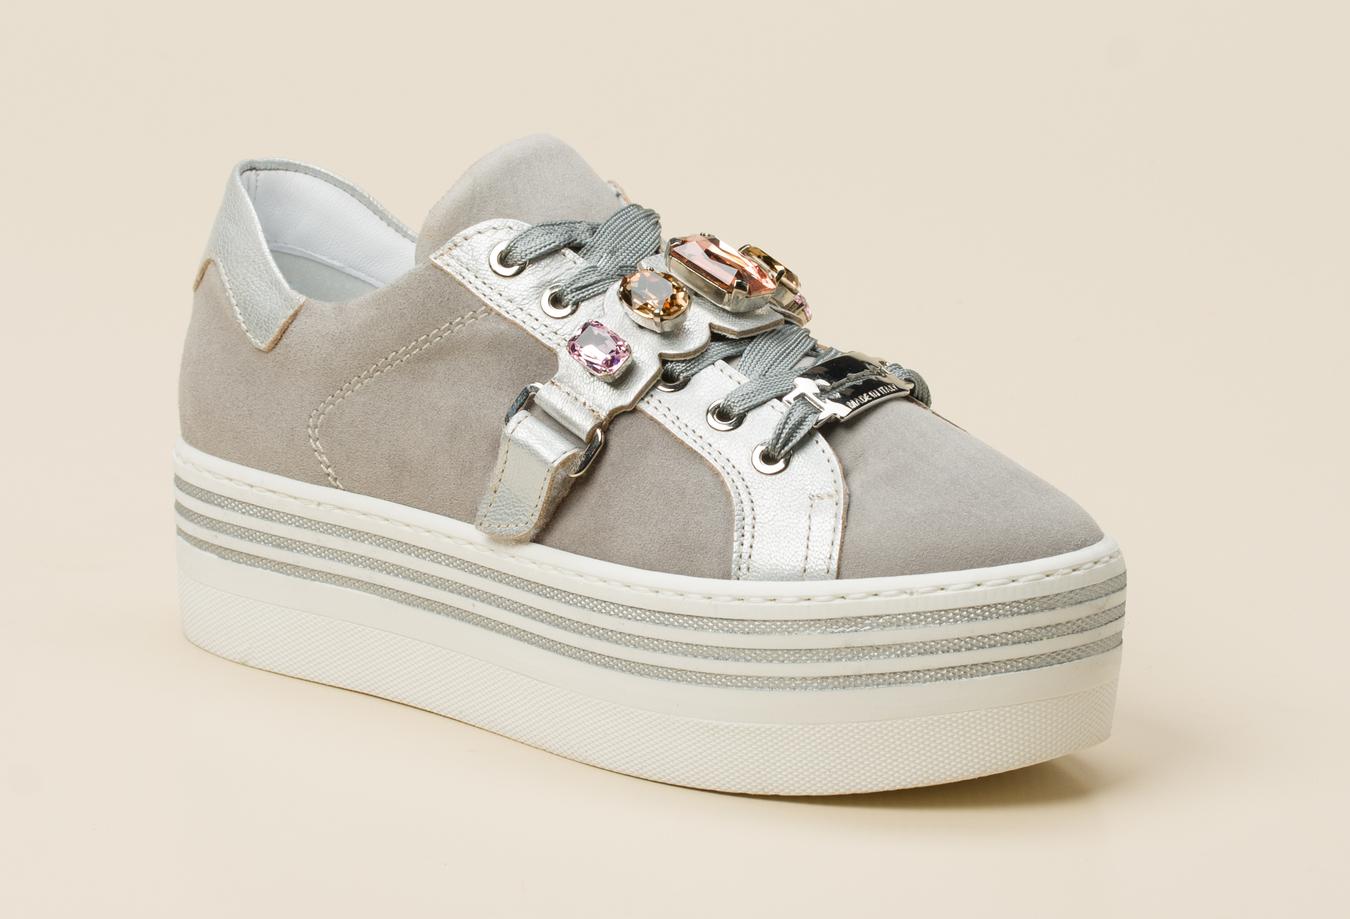 Andrea Puccini Damen Sneaker in grau kaufen | Zumnorde Online Shop